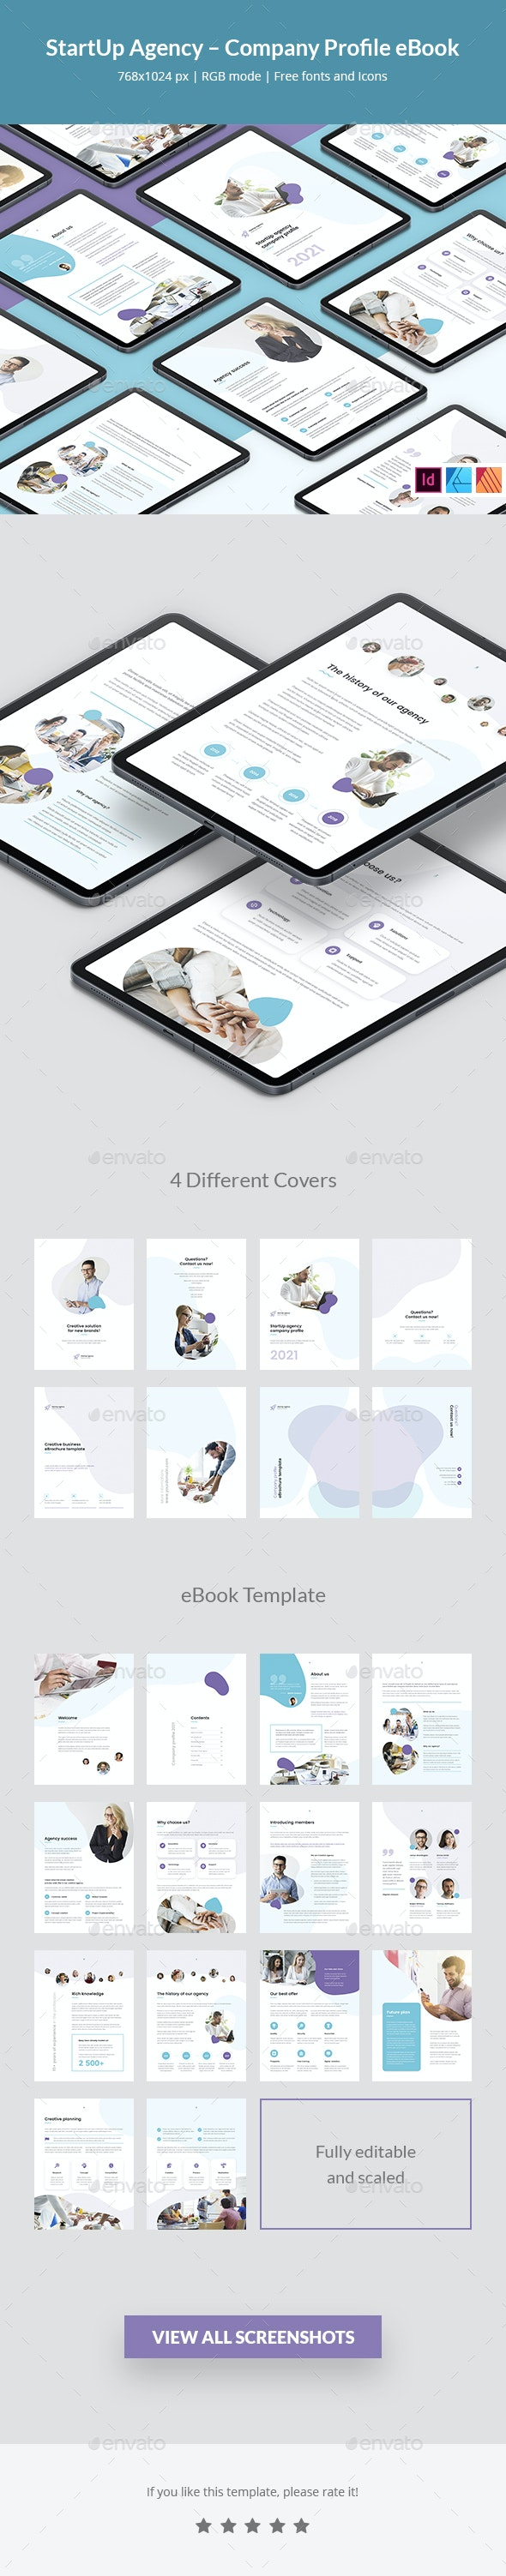 StartUp Agency – Company Profile eBook - Digital Books ePublishing